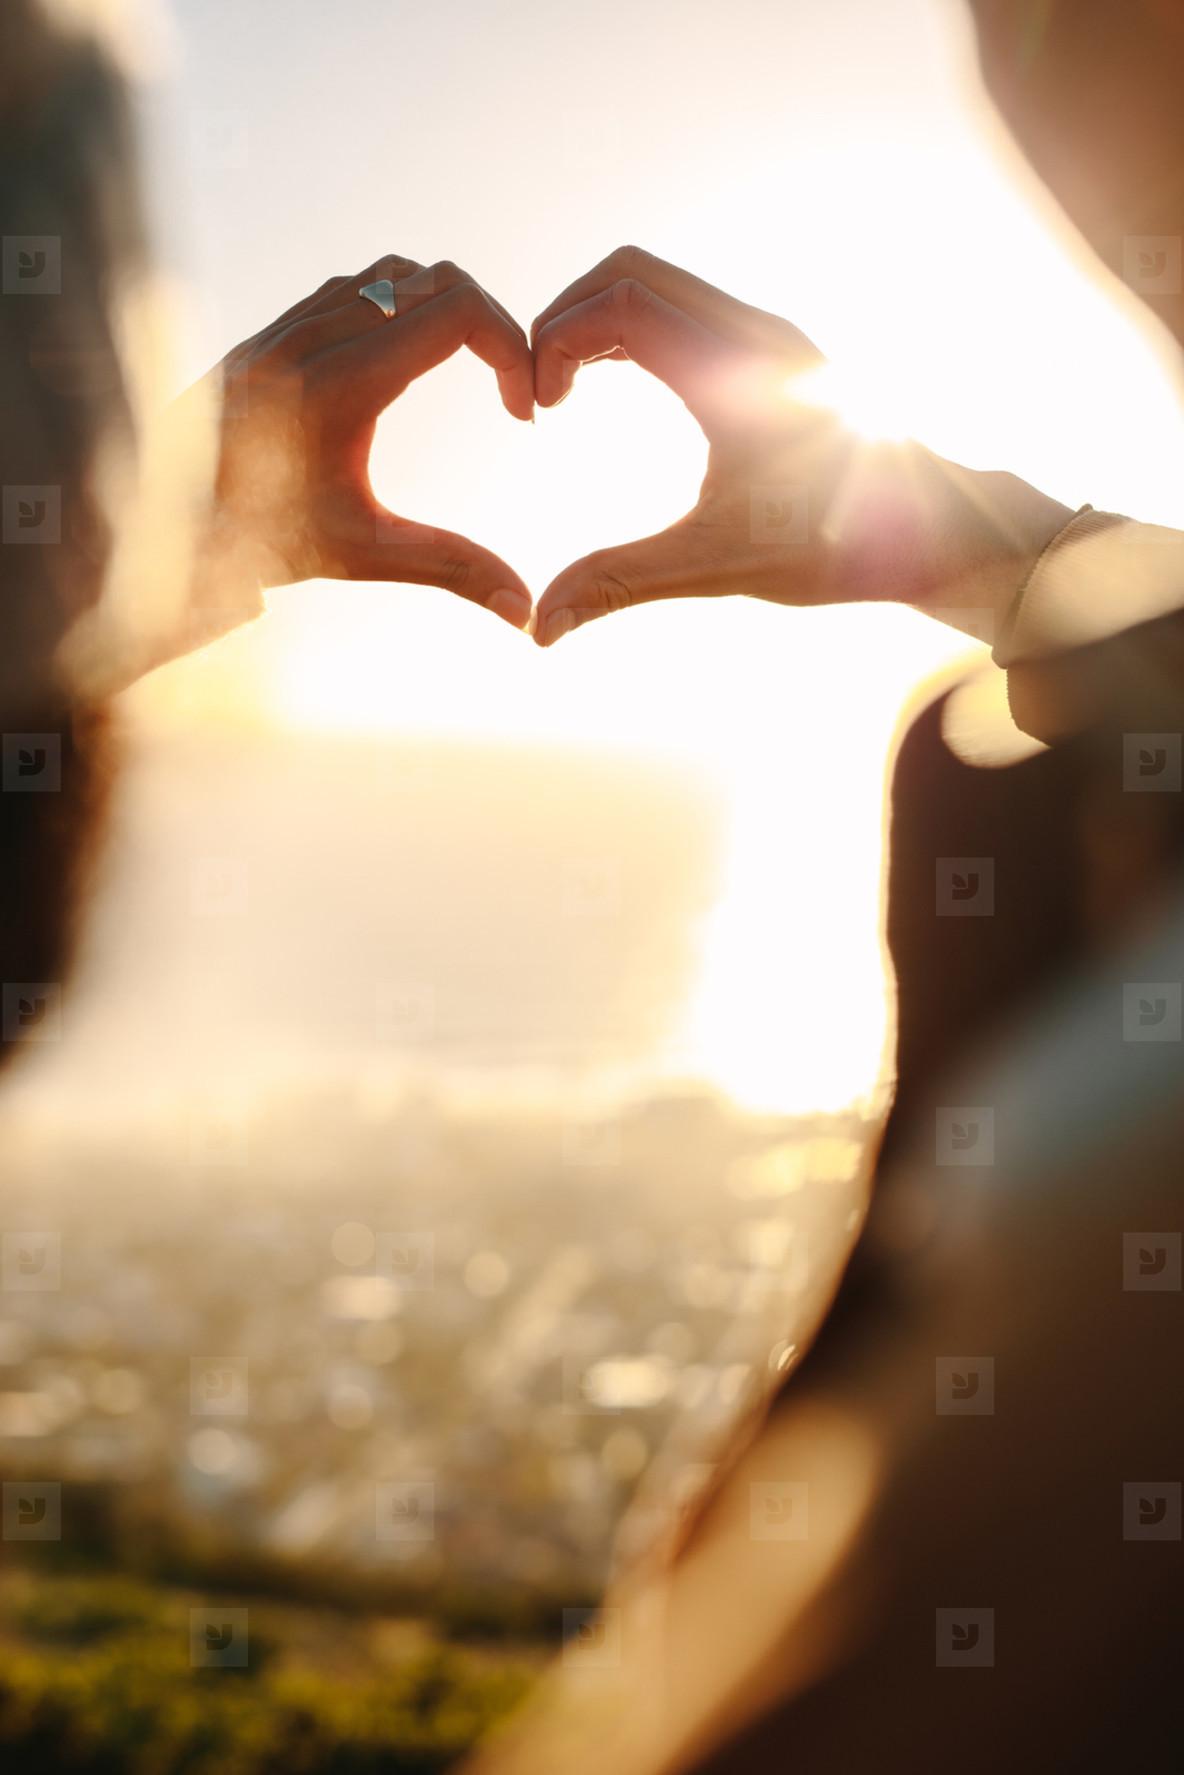 Romantic couple making a finger heart